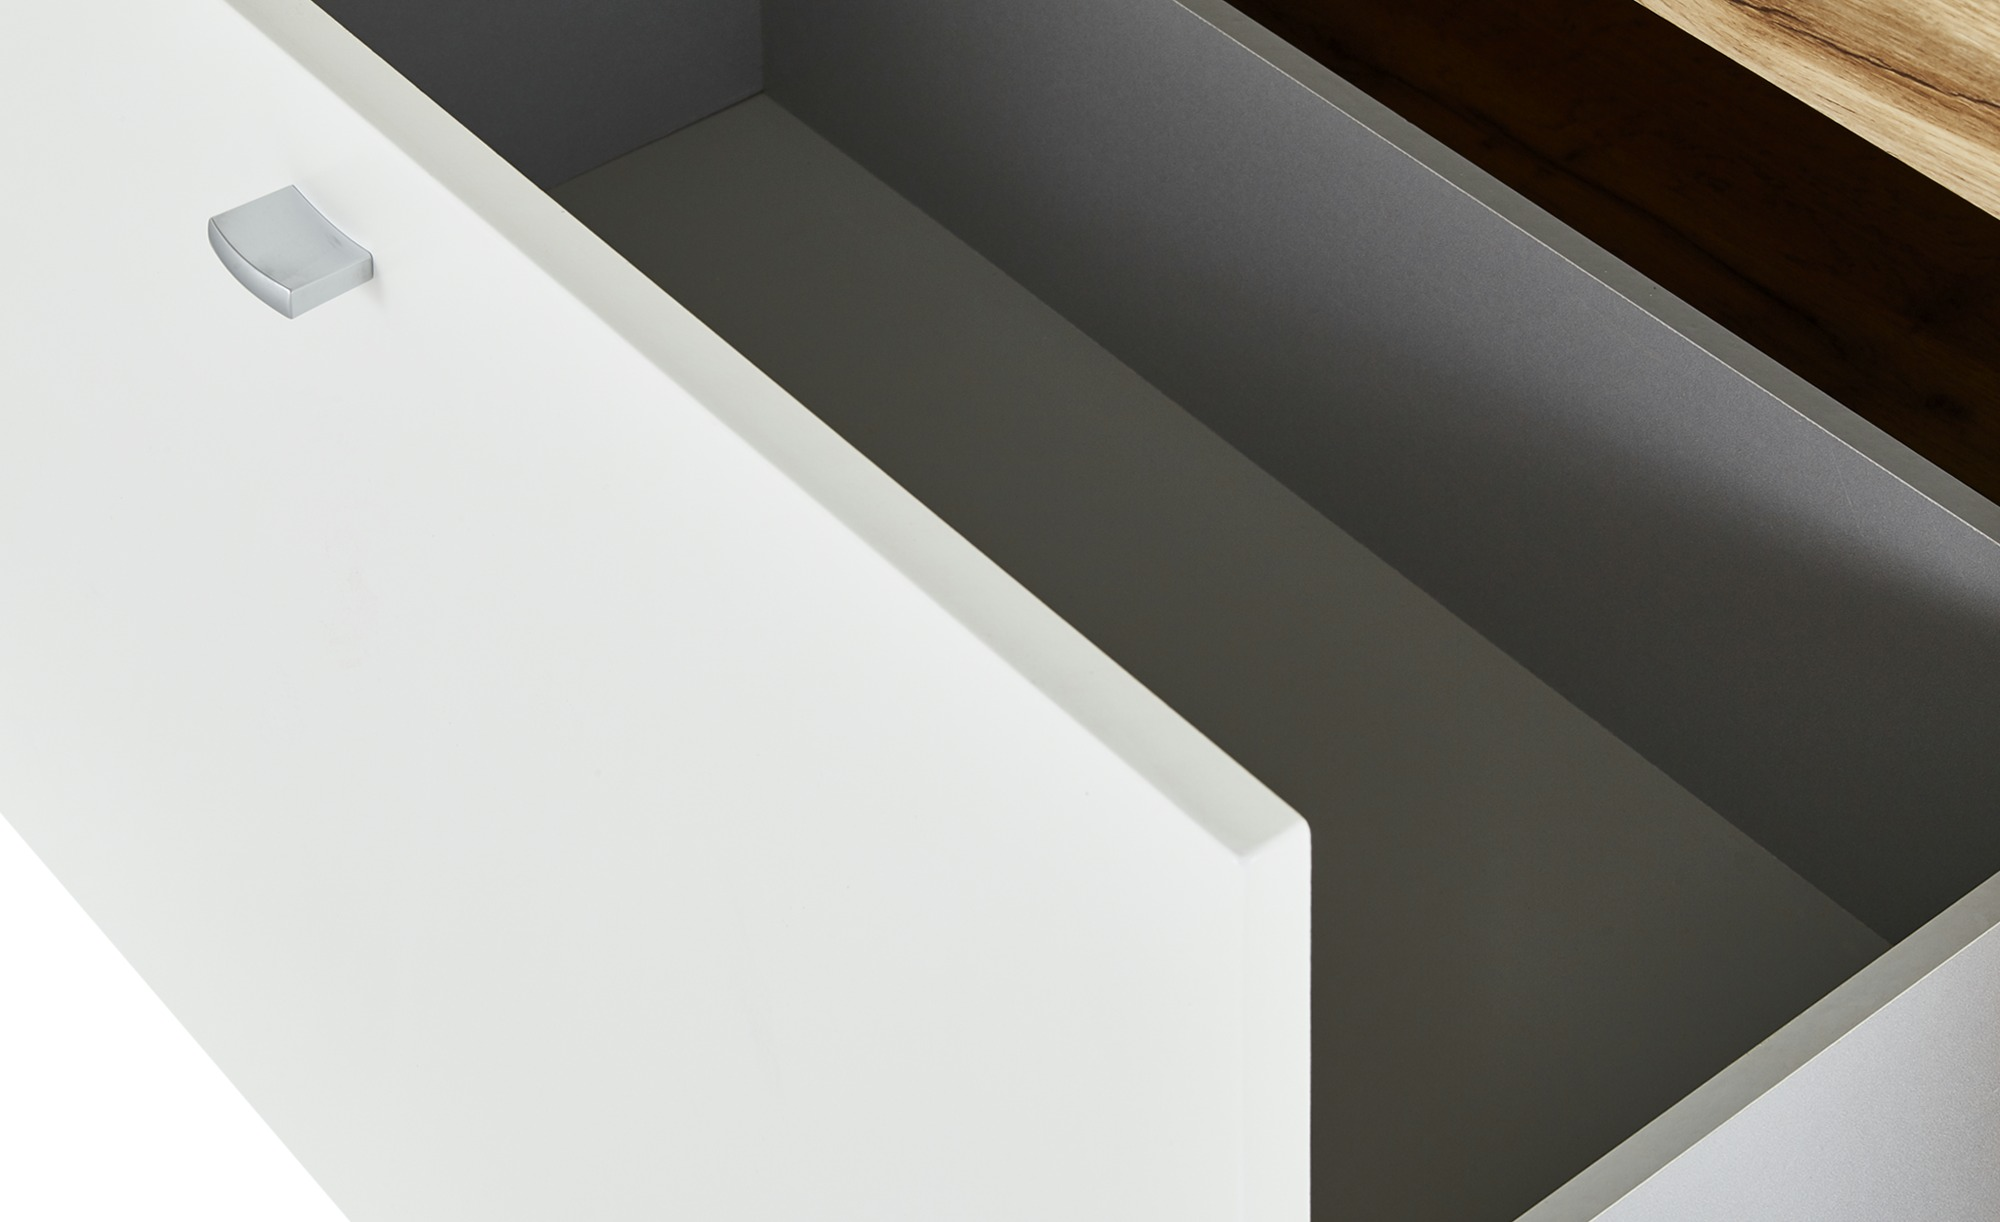 uno Sideboard  Terrazzo ¦ holzfarben ¦ Maße (cm): B: 190 H: 86 T: 50 Kommoden & Sideboards > Sideboards - Höffner